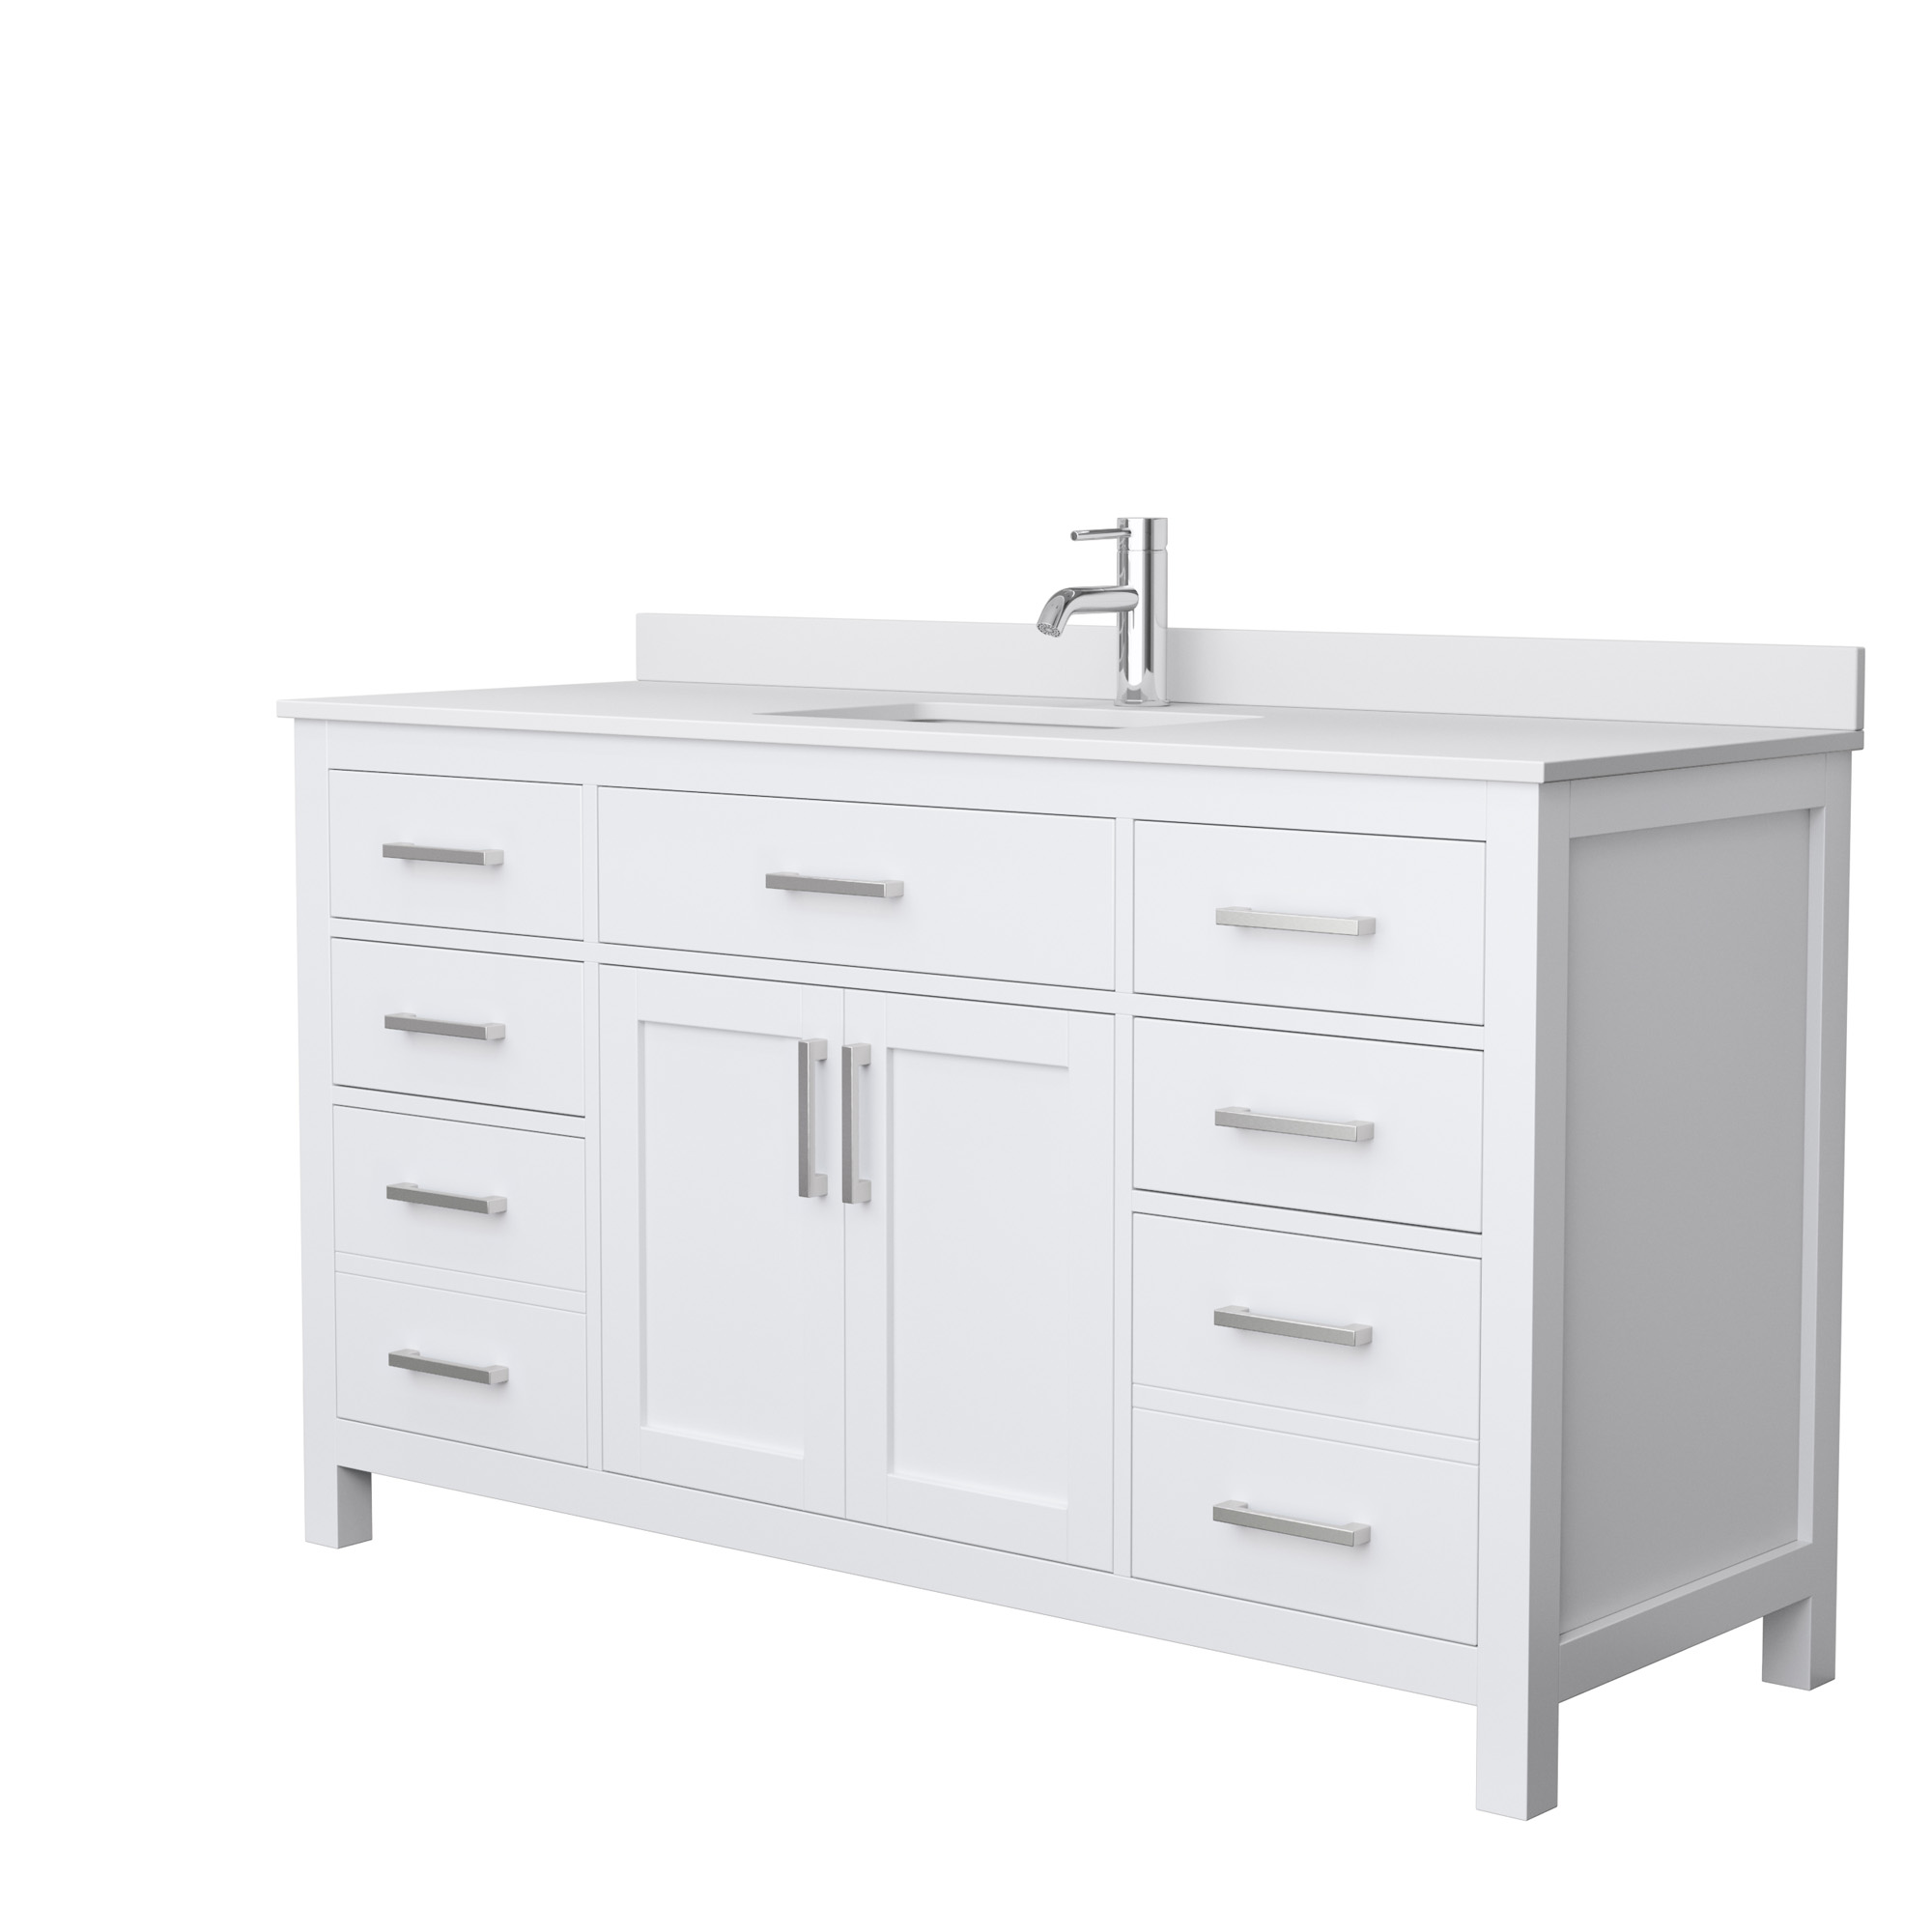 beckett 60 single bathroom vanity white